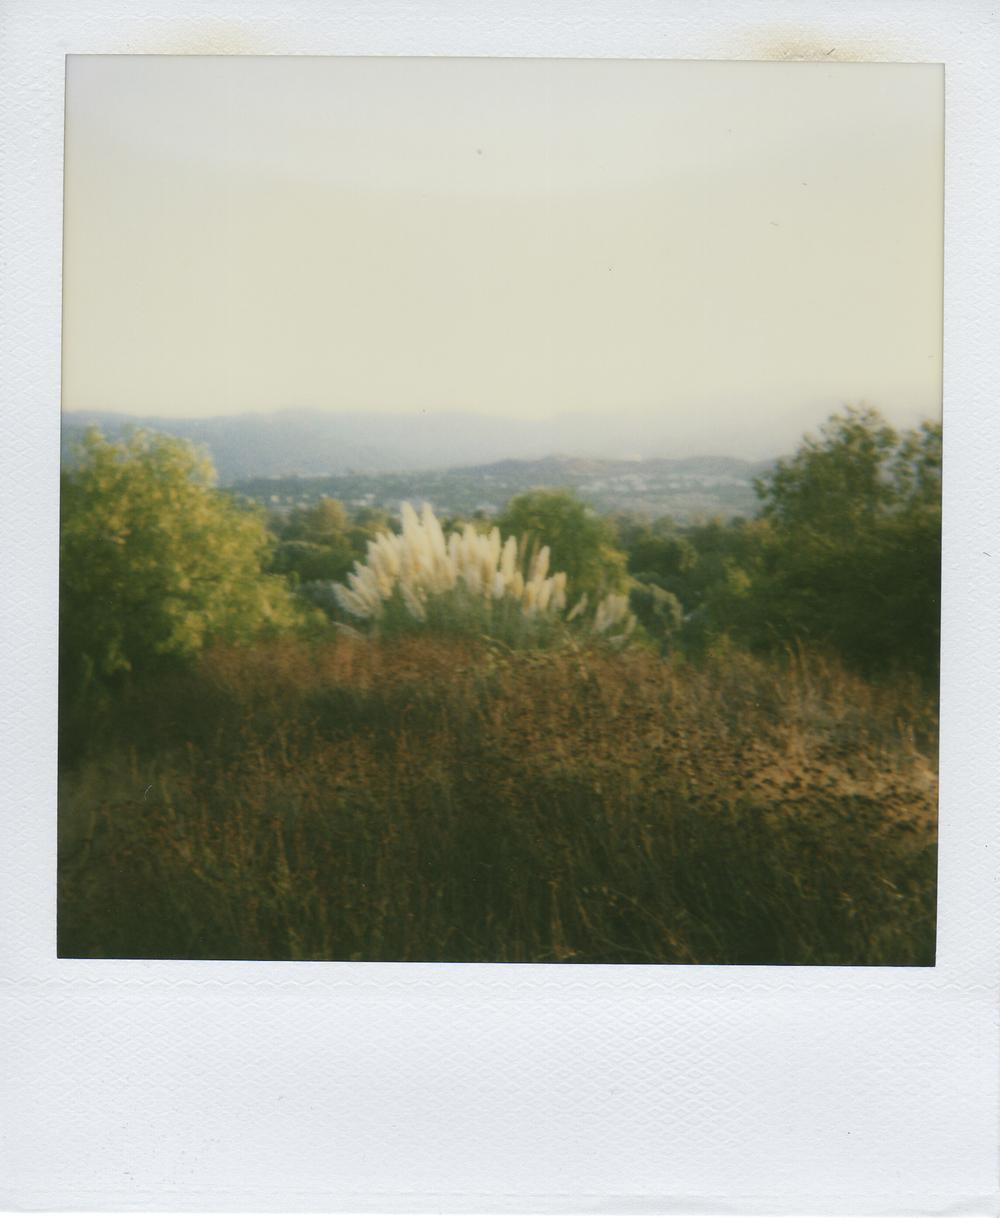 jlaurence-polaroid-135.jpg